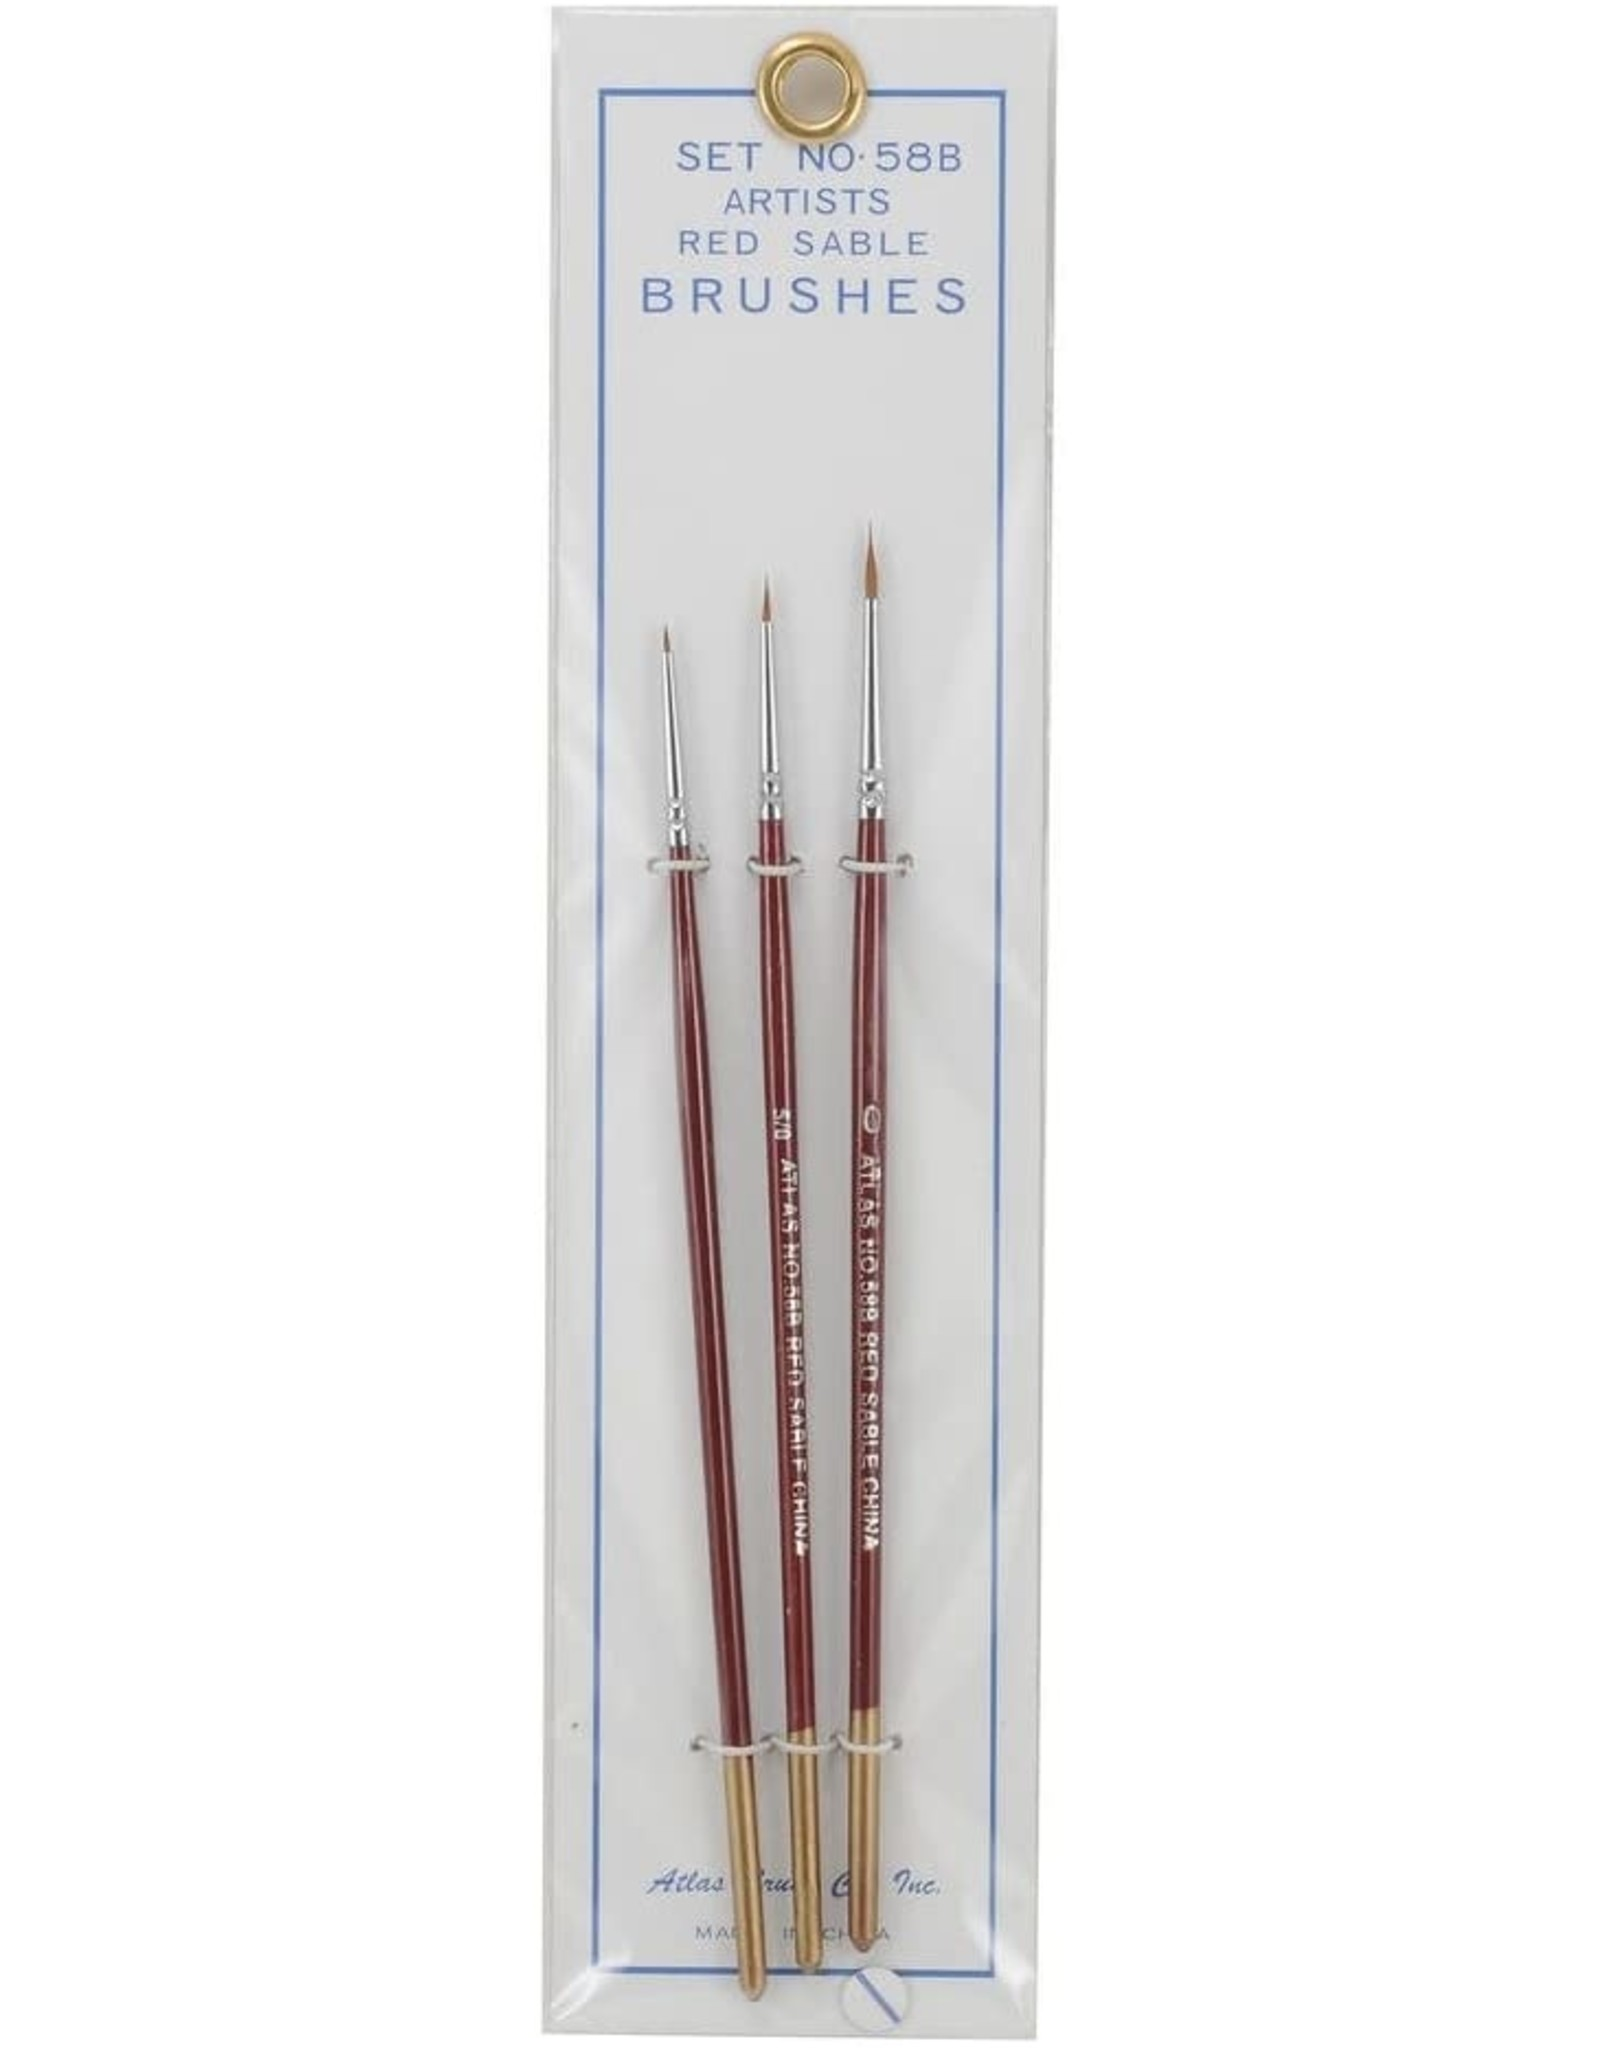 Atlas Brush Co. 58B - Red Sable 3 Piece Brush Set, 10/0-5/0-0